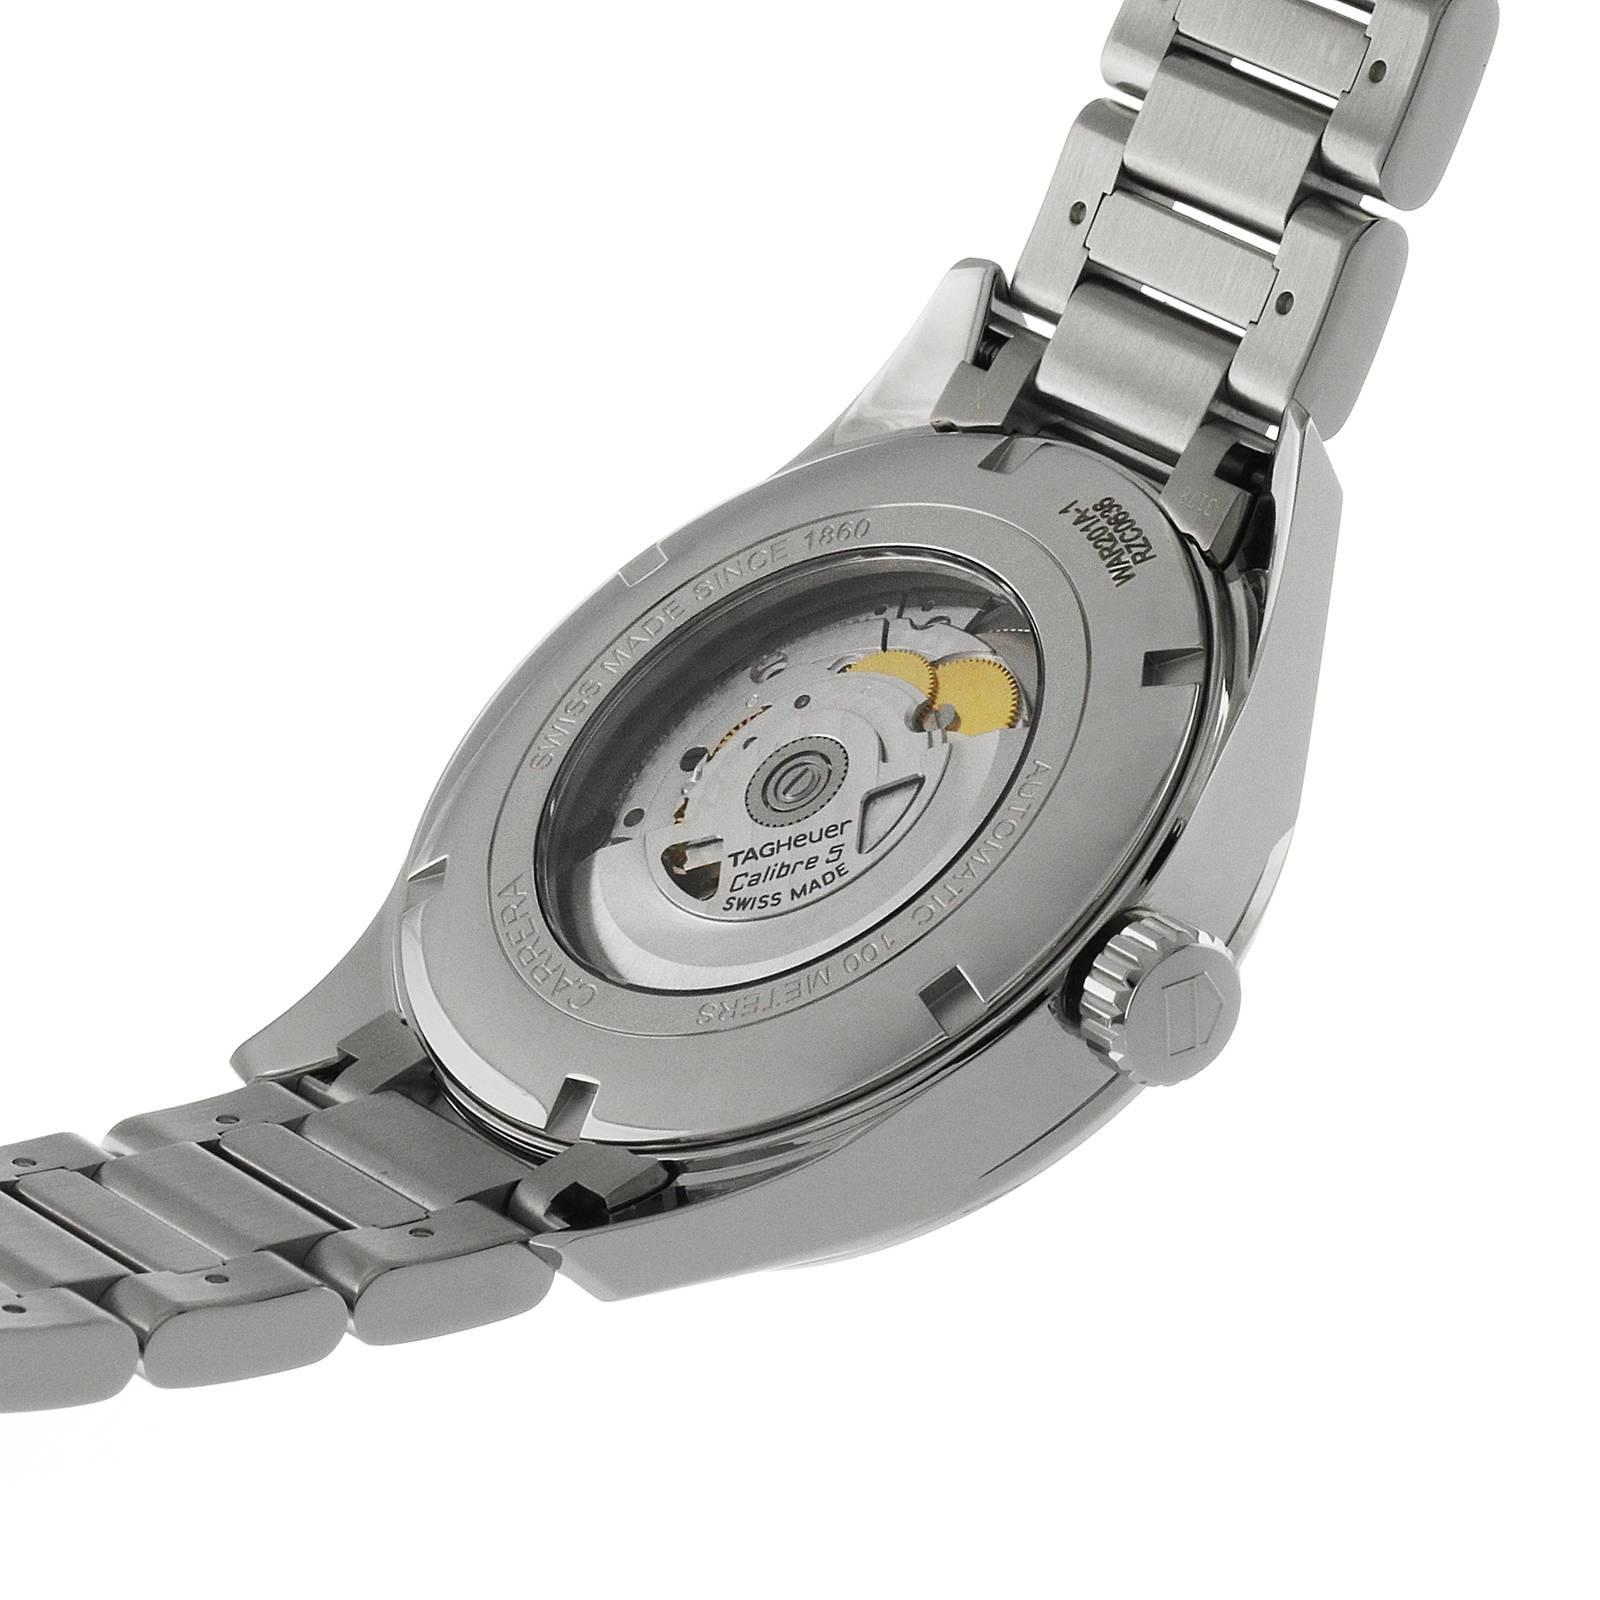 TAG Heuer Carrera Calibre 5 44mm Automatic Mens Watch